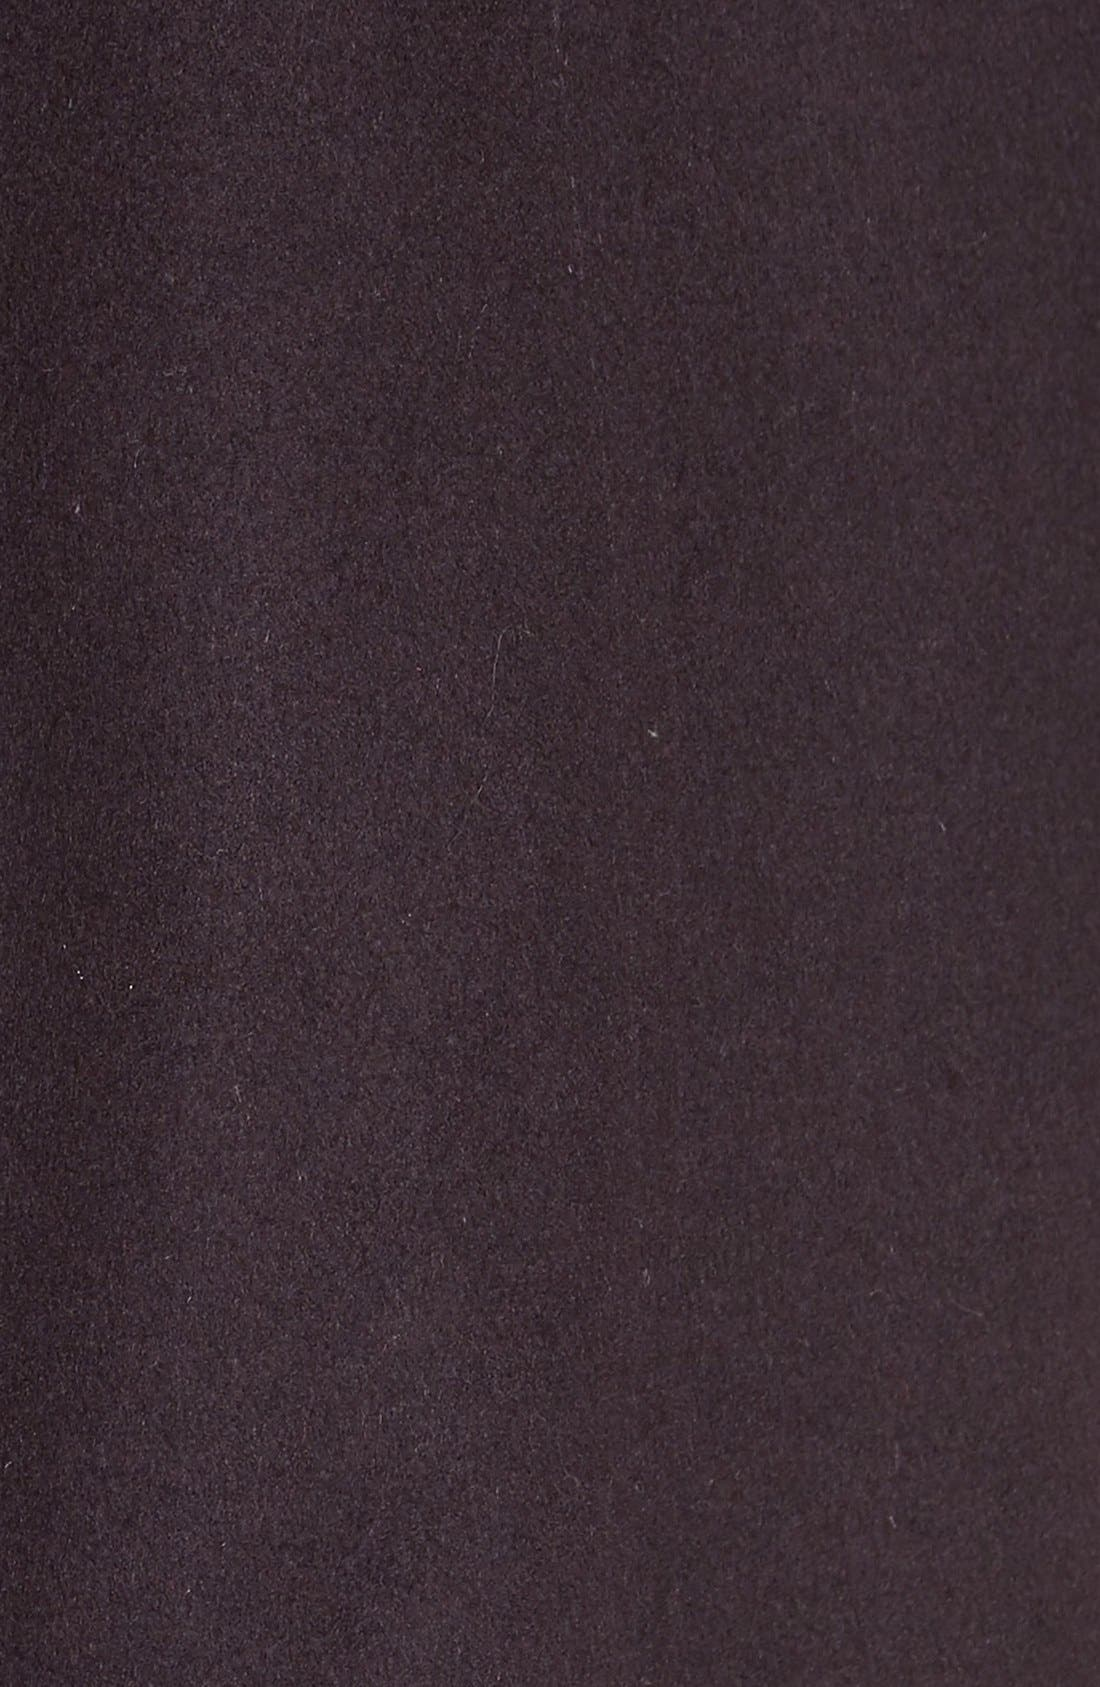 Wool Blend Walking Coat,                             Alternate thumbnail 20, color,